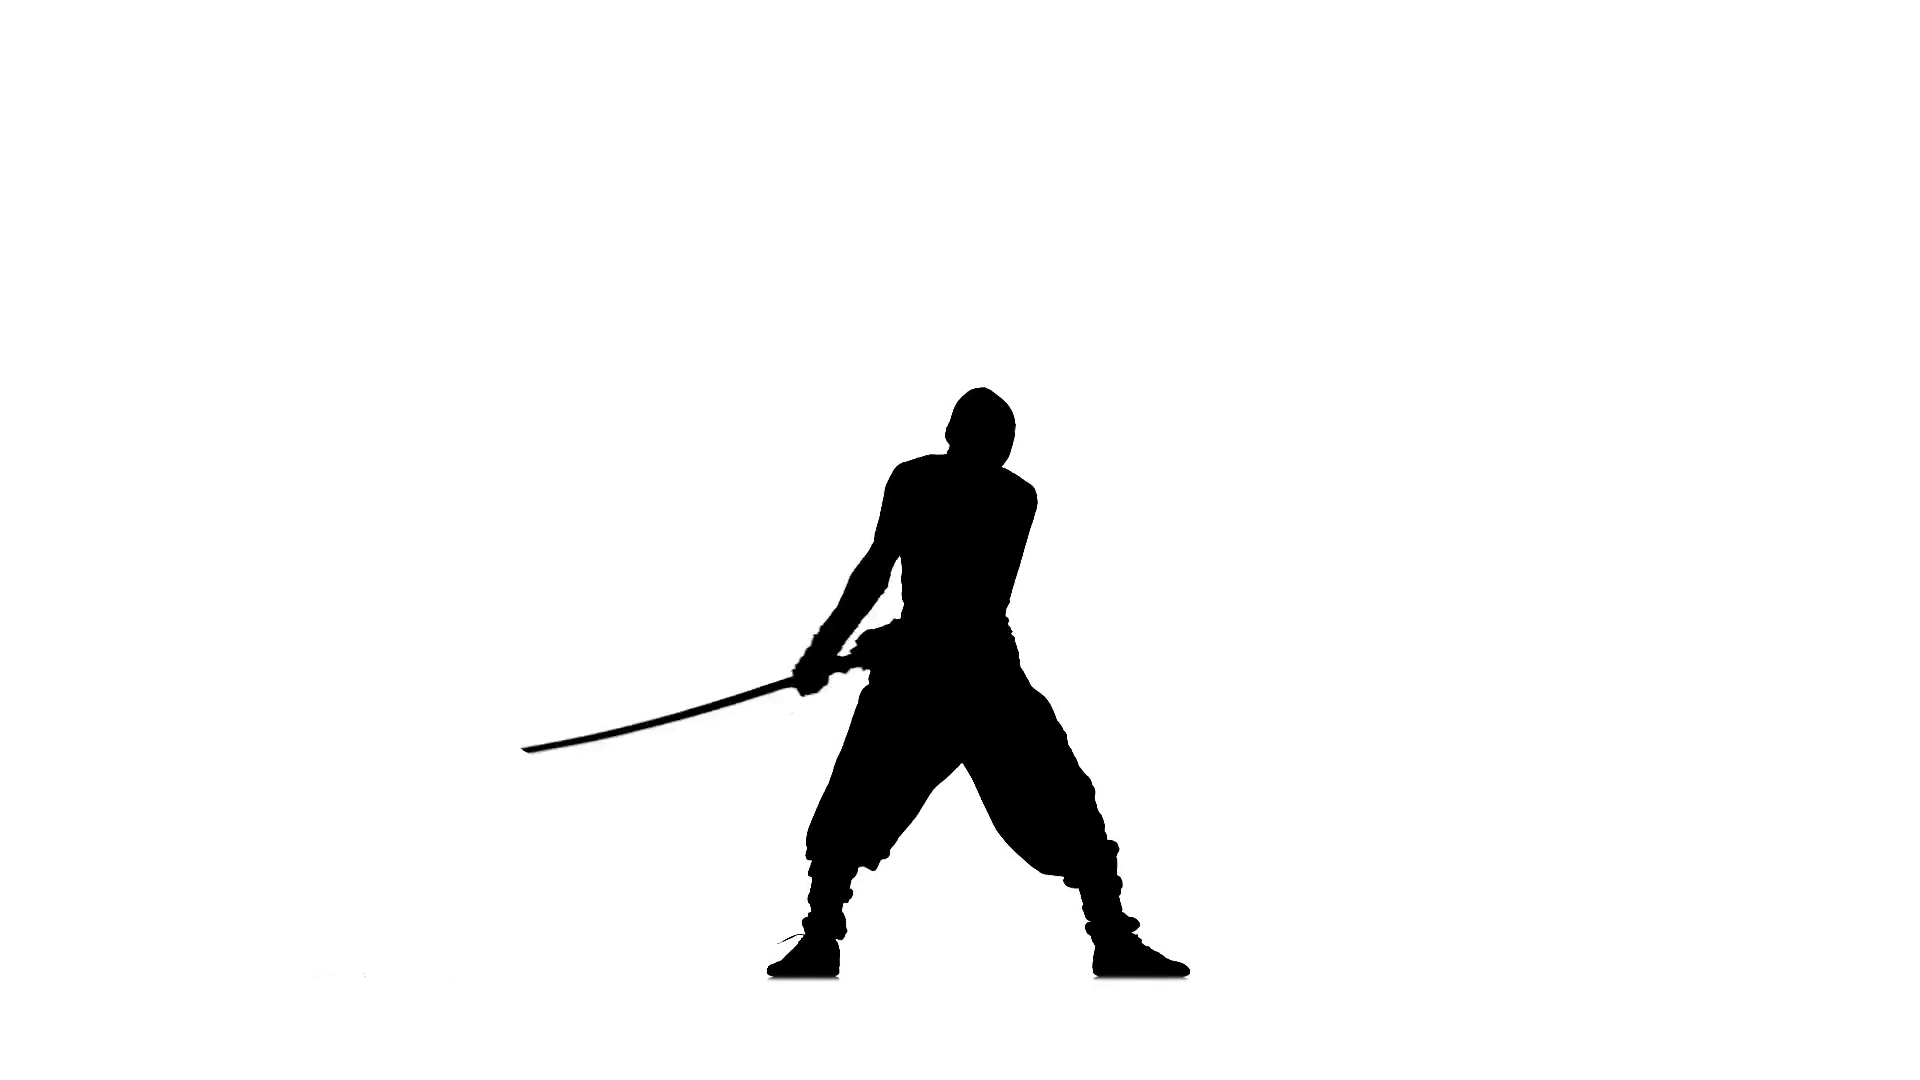 1920x1080 Ninja Stylei. Slhouette Of Man With Sword On White Background